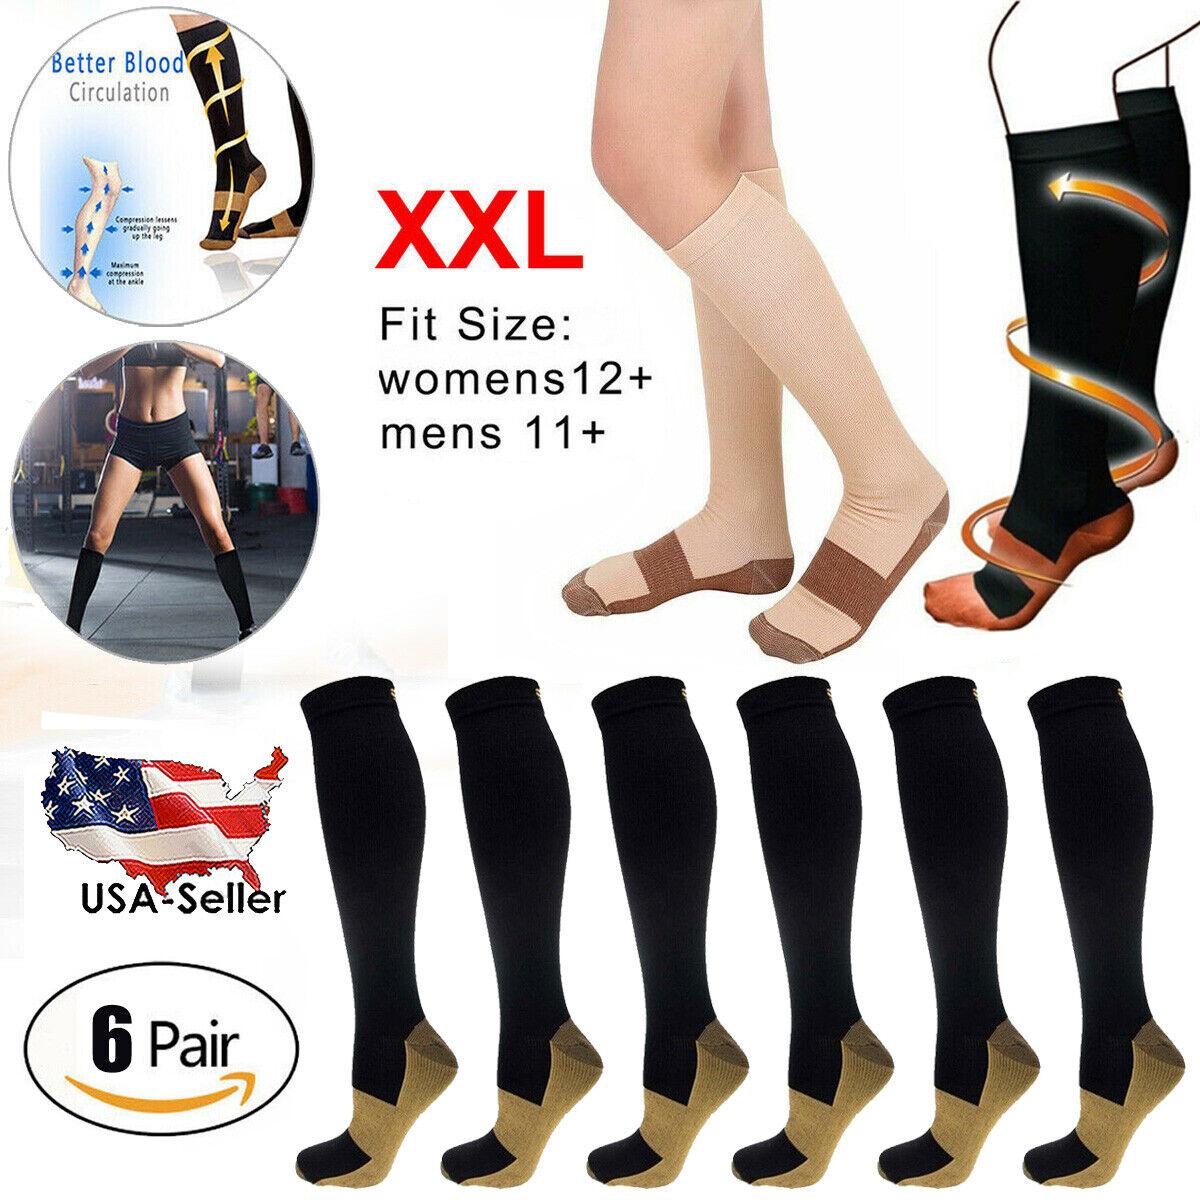 "Dissent Supercrew Nano 8/"" + Copper Compression socks Black XL Men 12+"